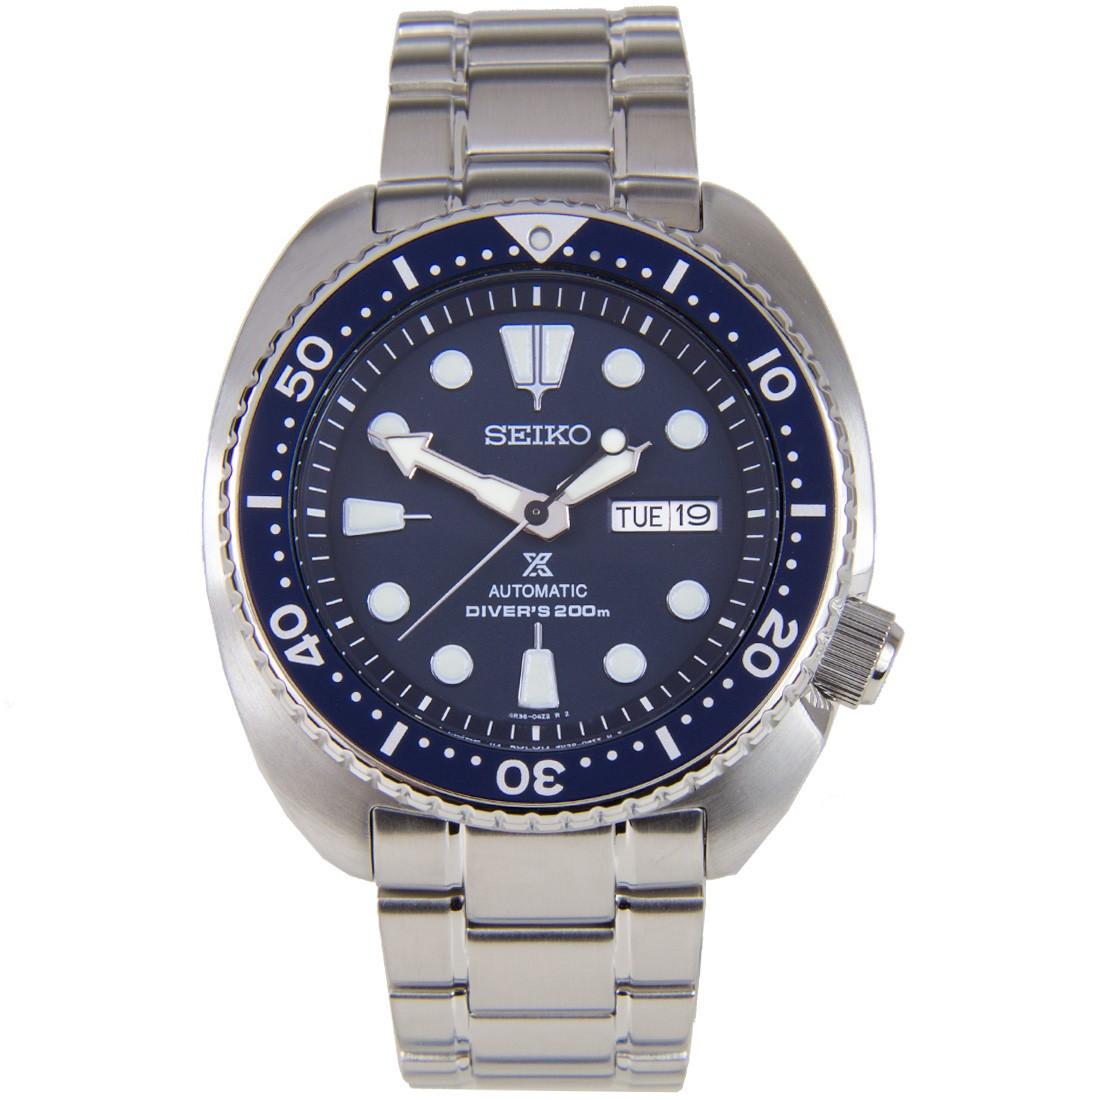 Часы Seiko Prospex SRP773K1 Turtle Automatic Diver's 4R36